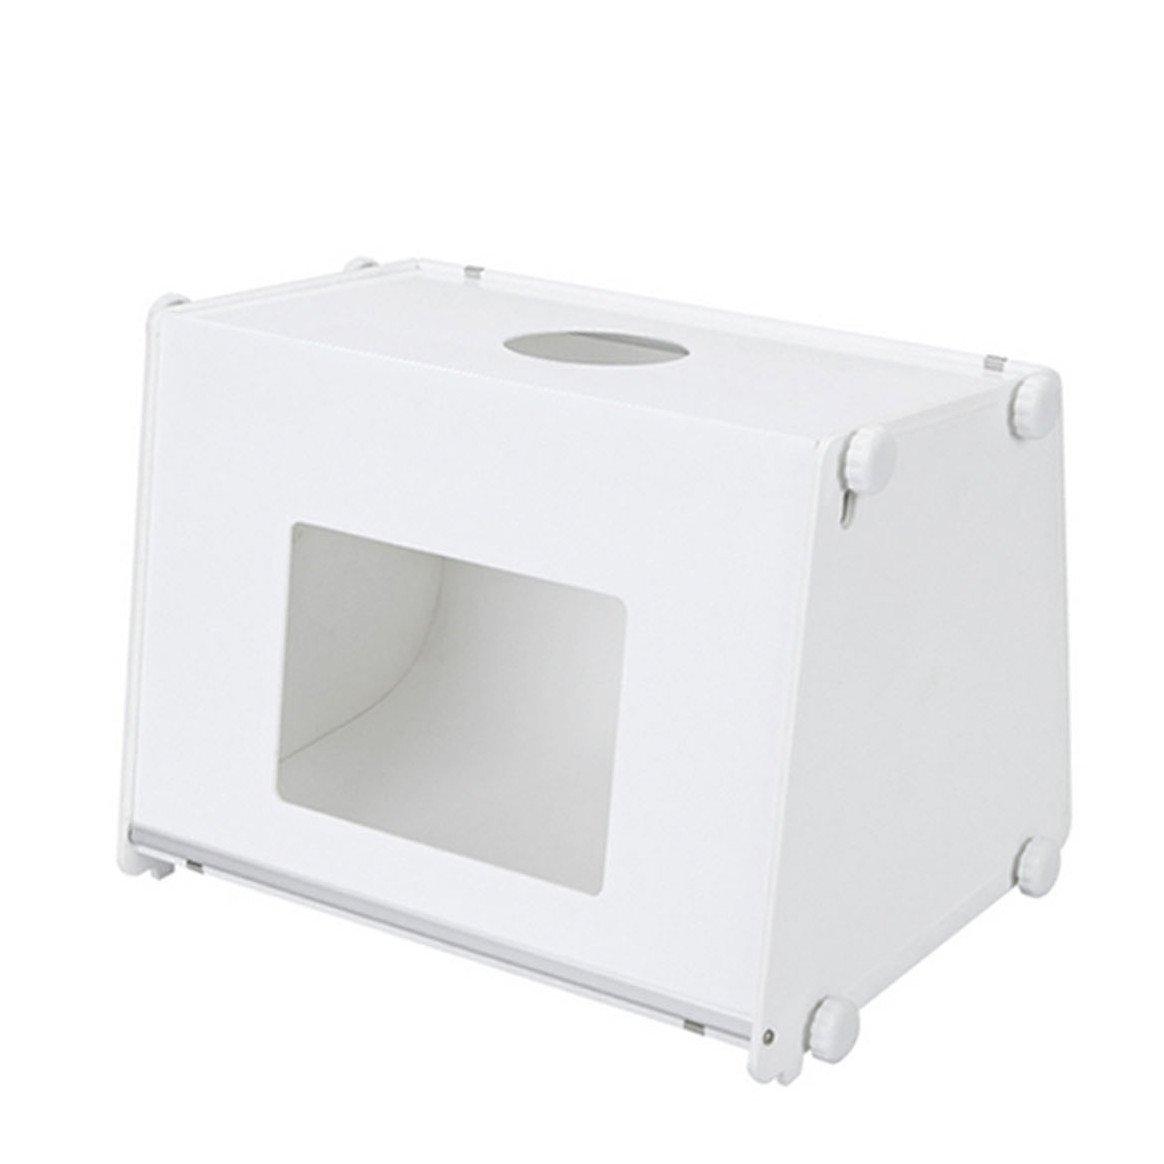 MSAK826W Photo Light Box